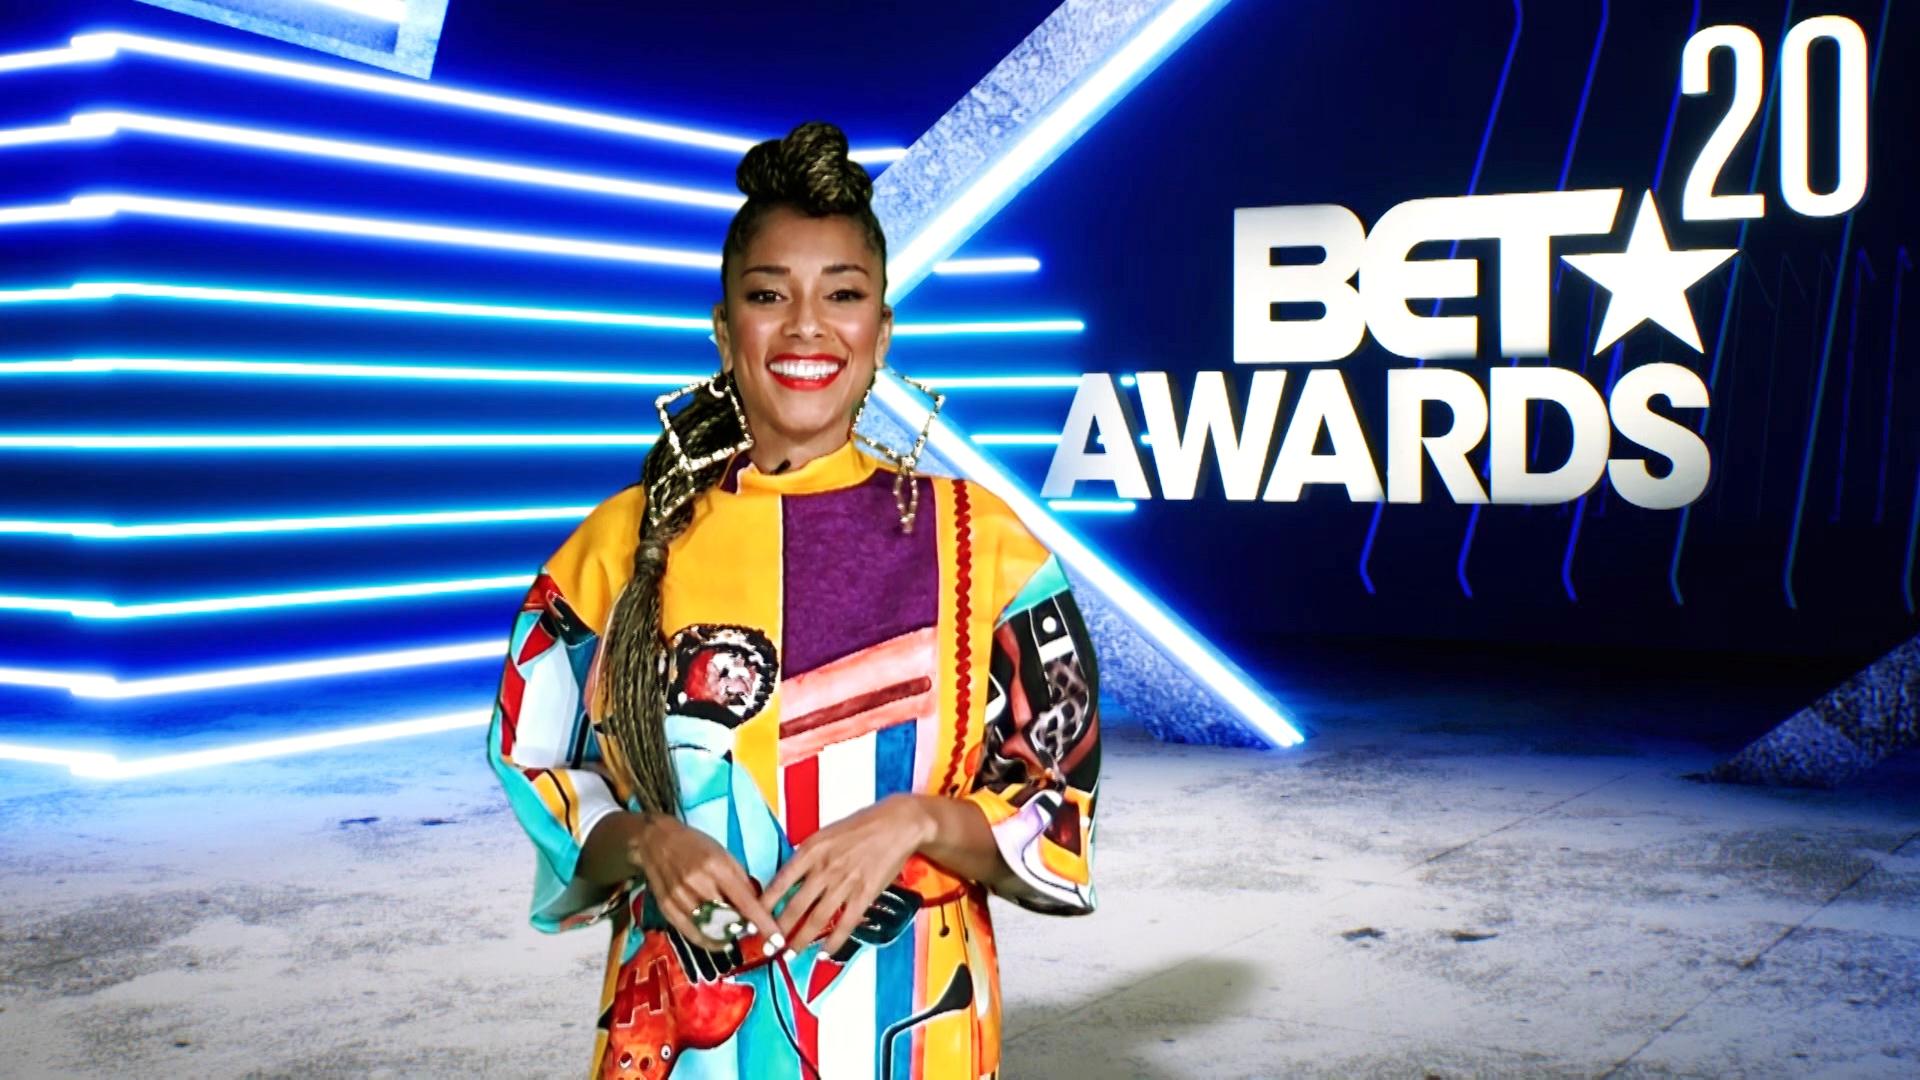 BET Awards 2020 - Amanda Seales. (Photo: BET)